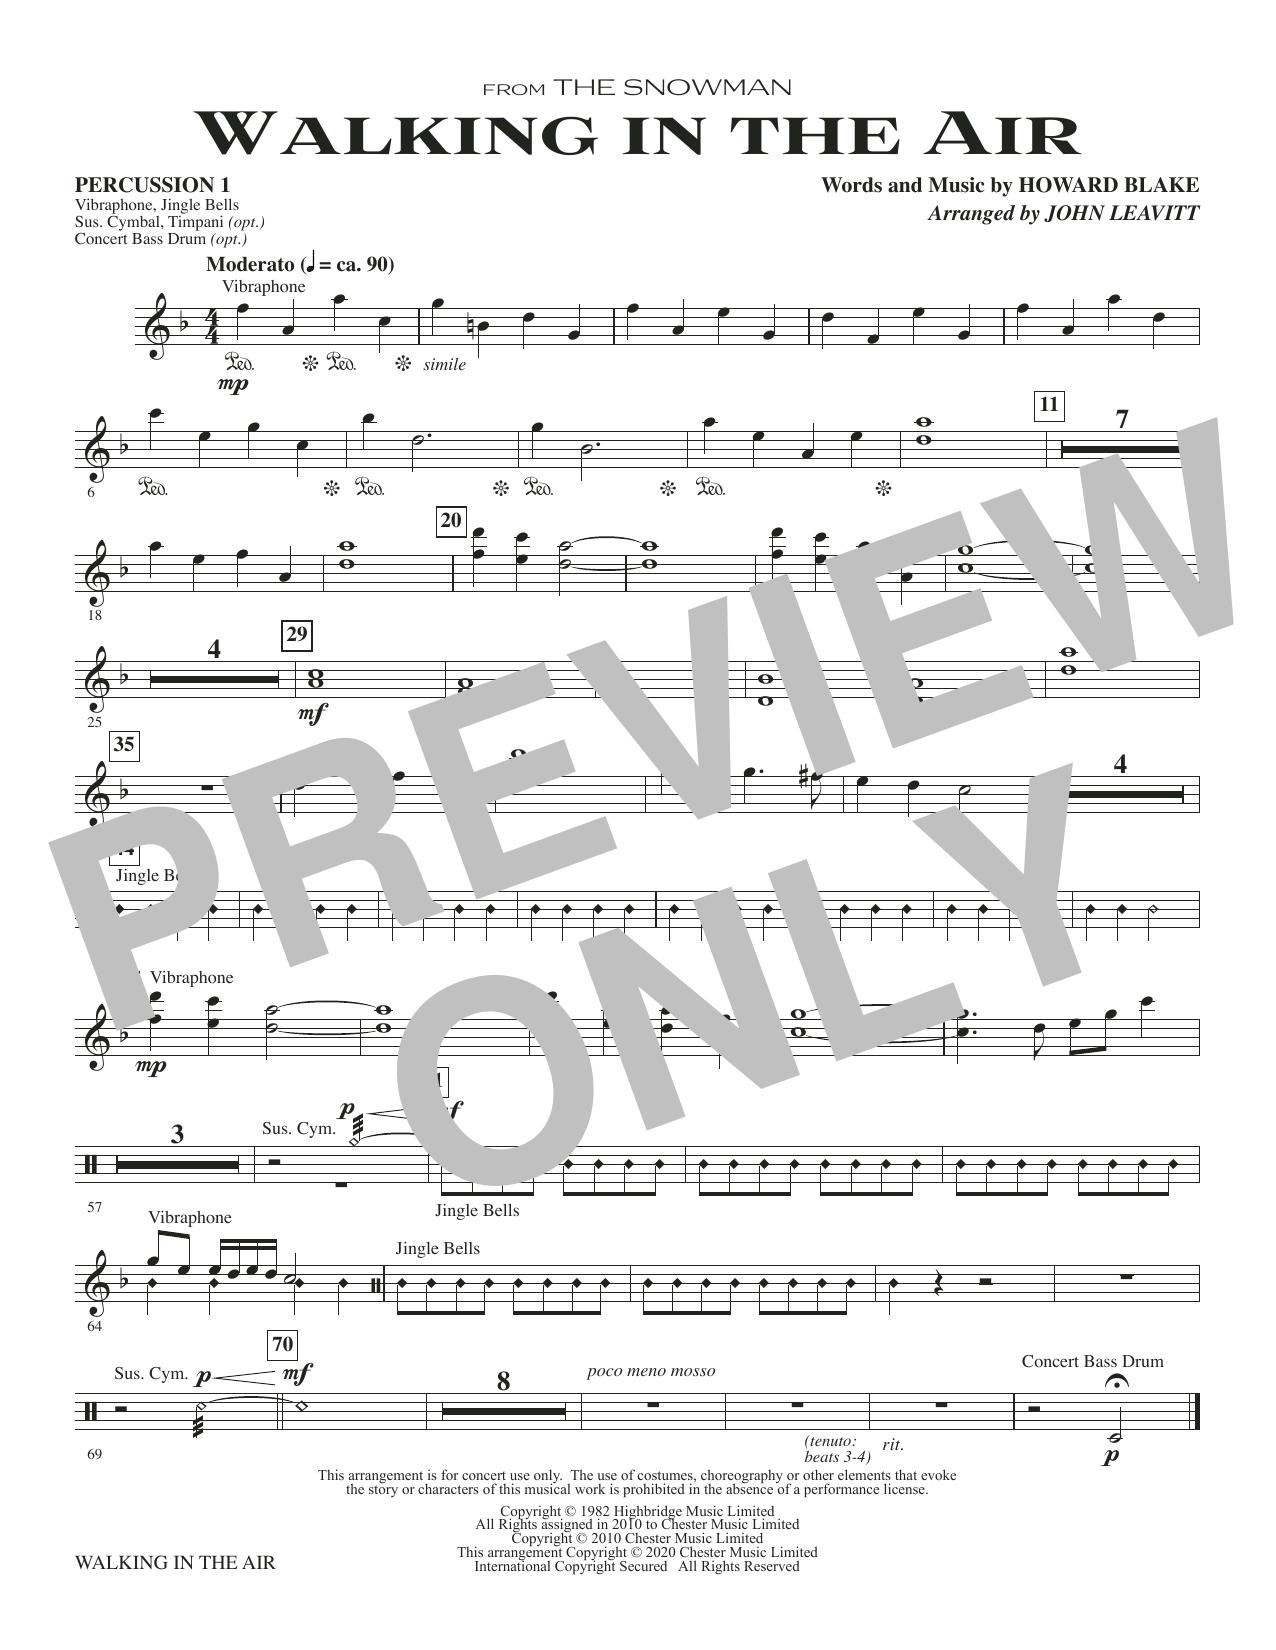 Walking In The Air (from The Snowman) (arr. John Leavitt) - Percussion 1 Sheet Music